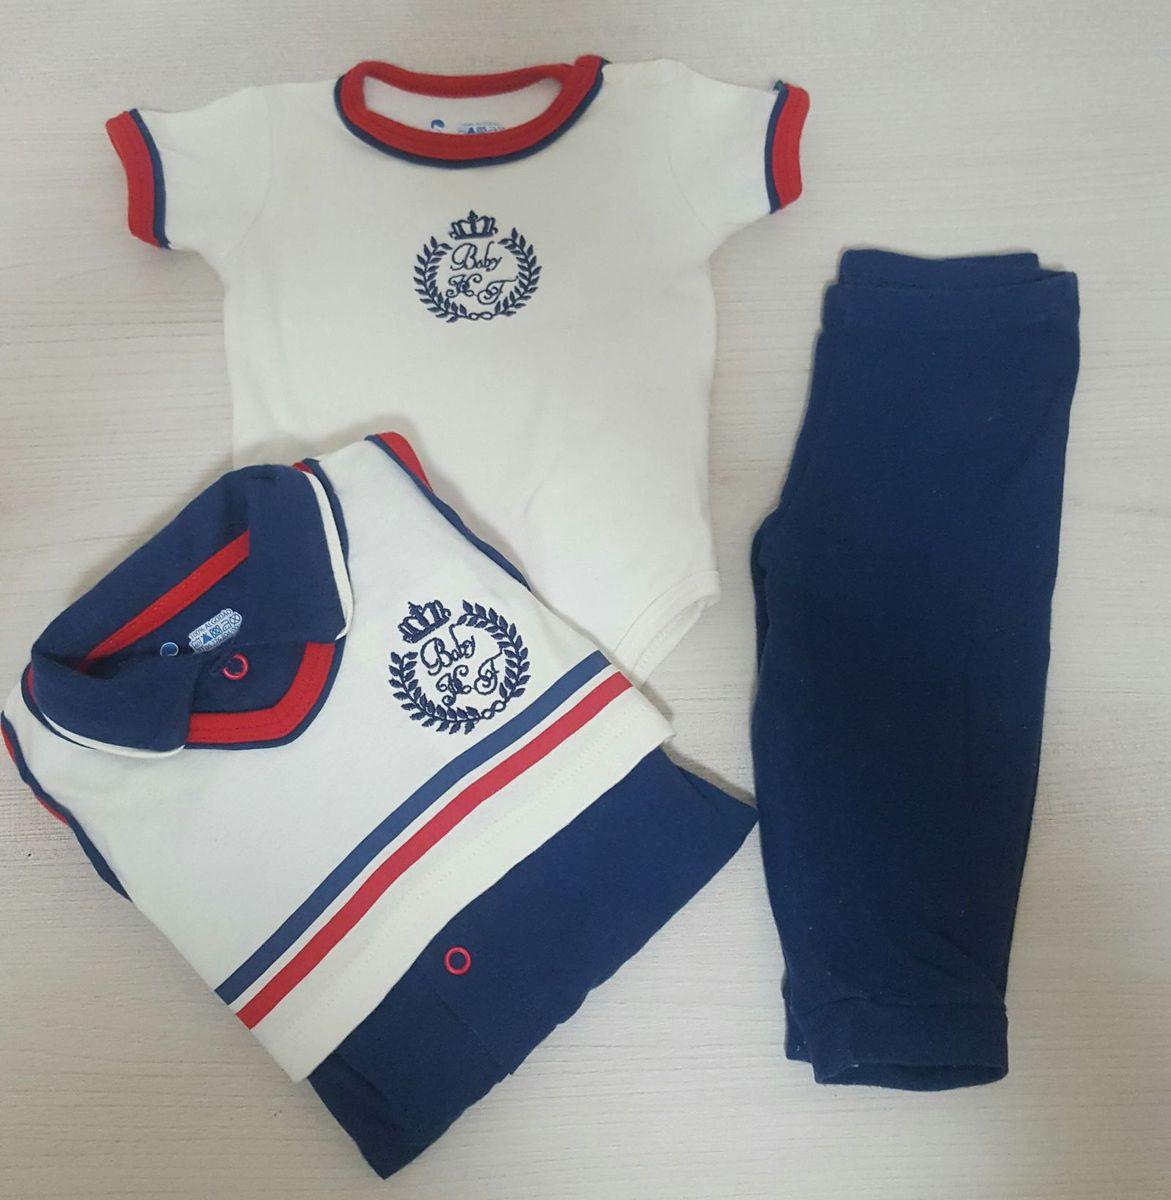 kit 3 peças ( body/calça/macacão) - bebê havefun